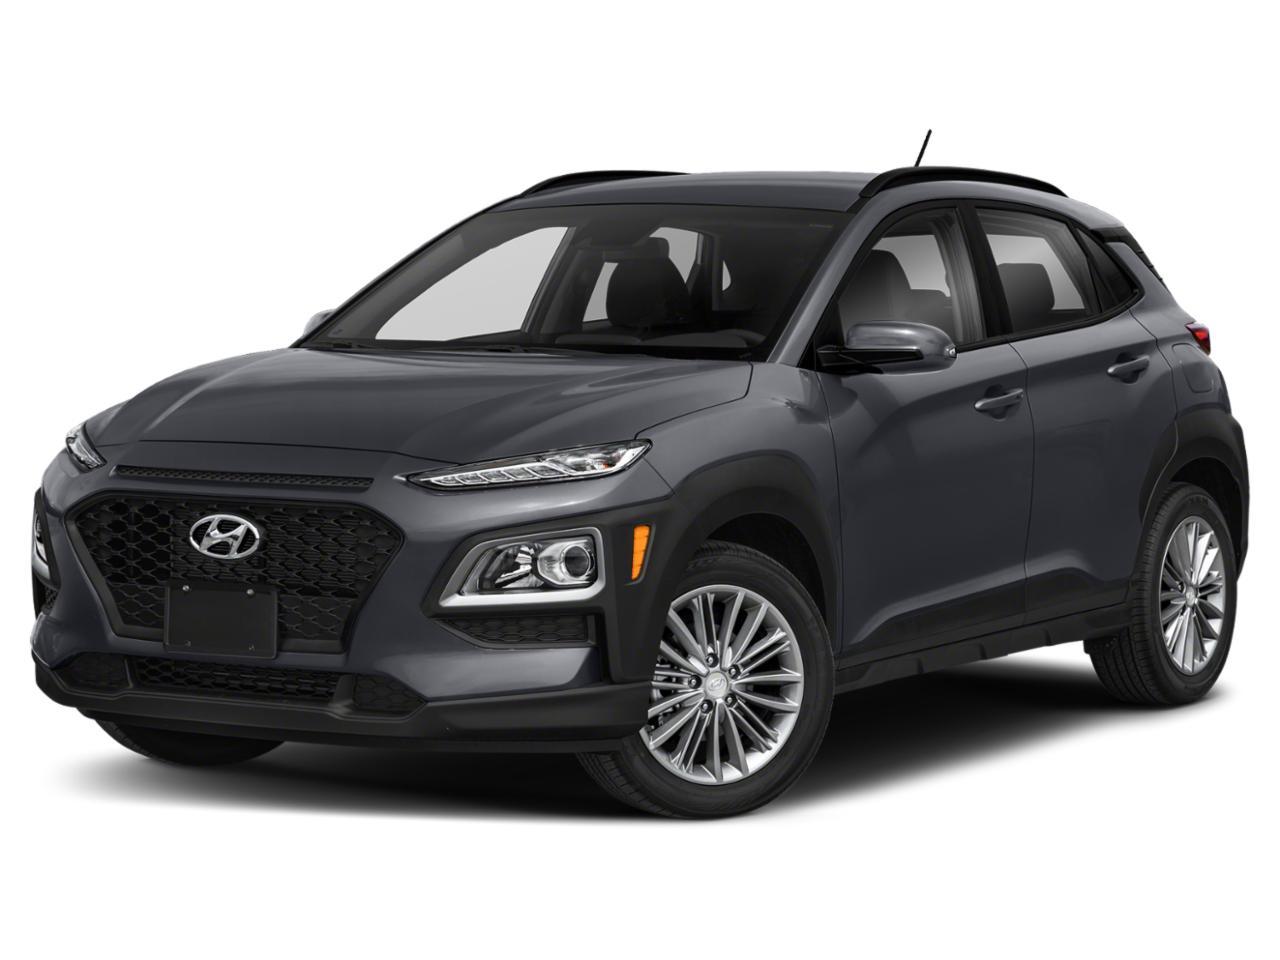 2021 Hyundai Kona Vehicle Photo in Owensboro, KY 42303